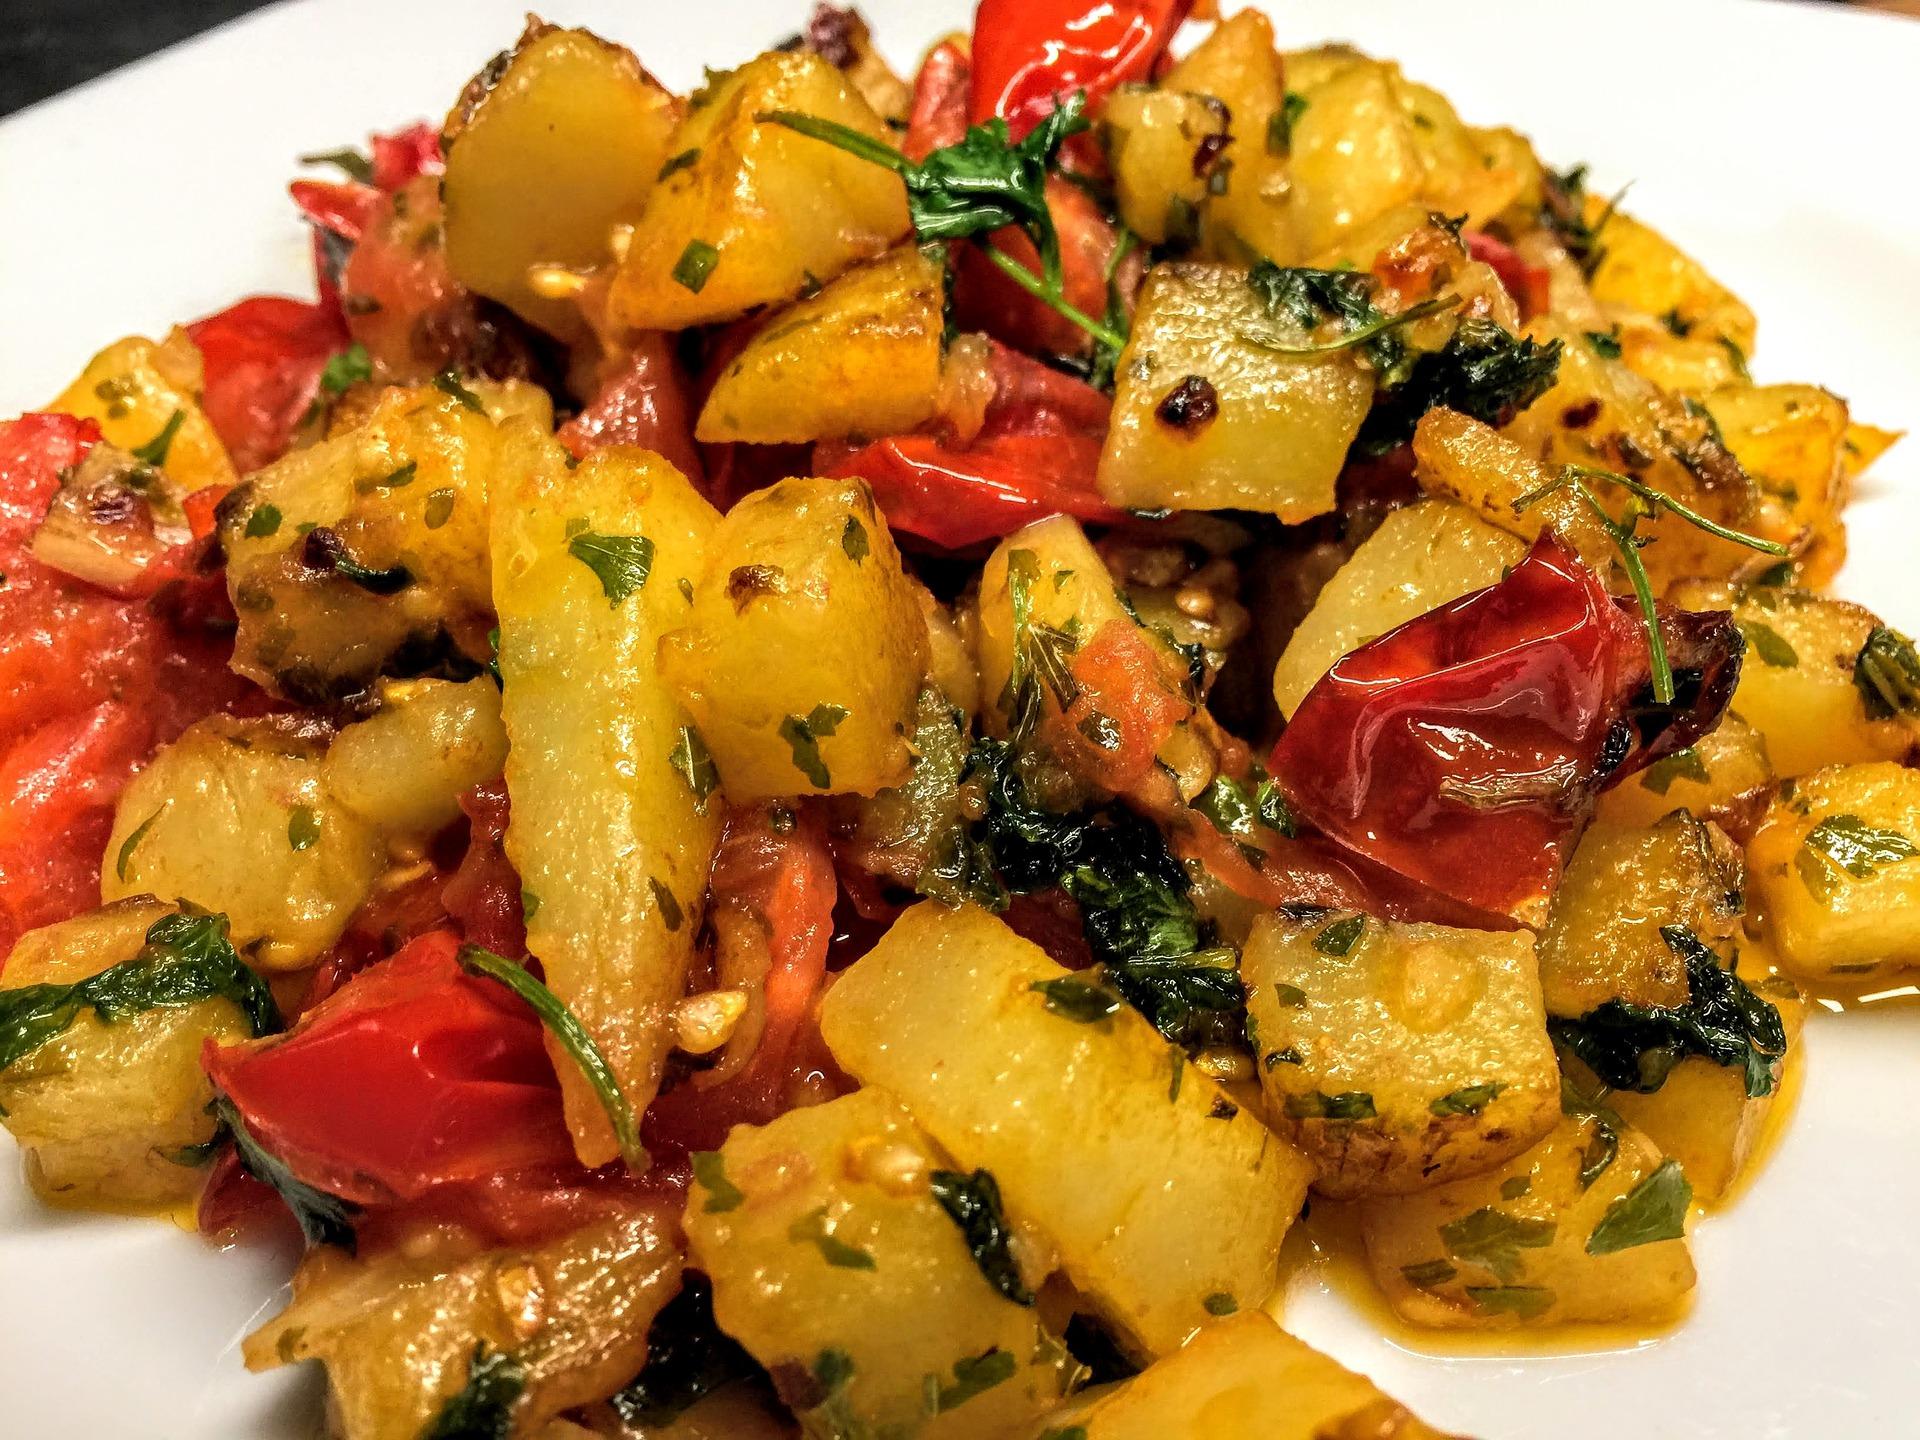 Salata de rosii cu cartofi - sfatulparintilor.ro - pixabay_com - potato-3560874_1920